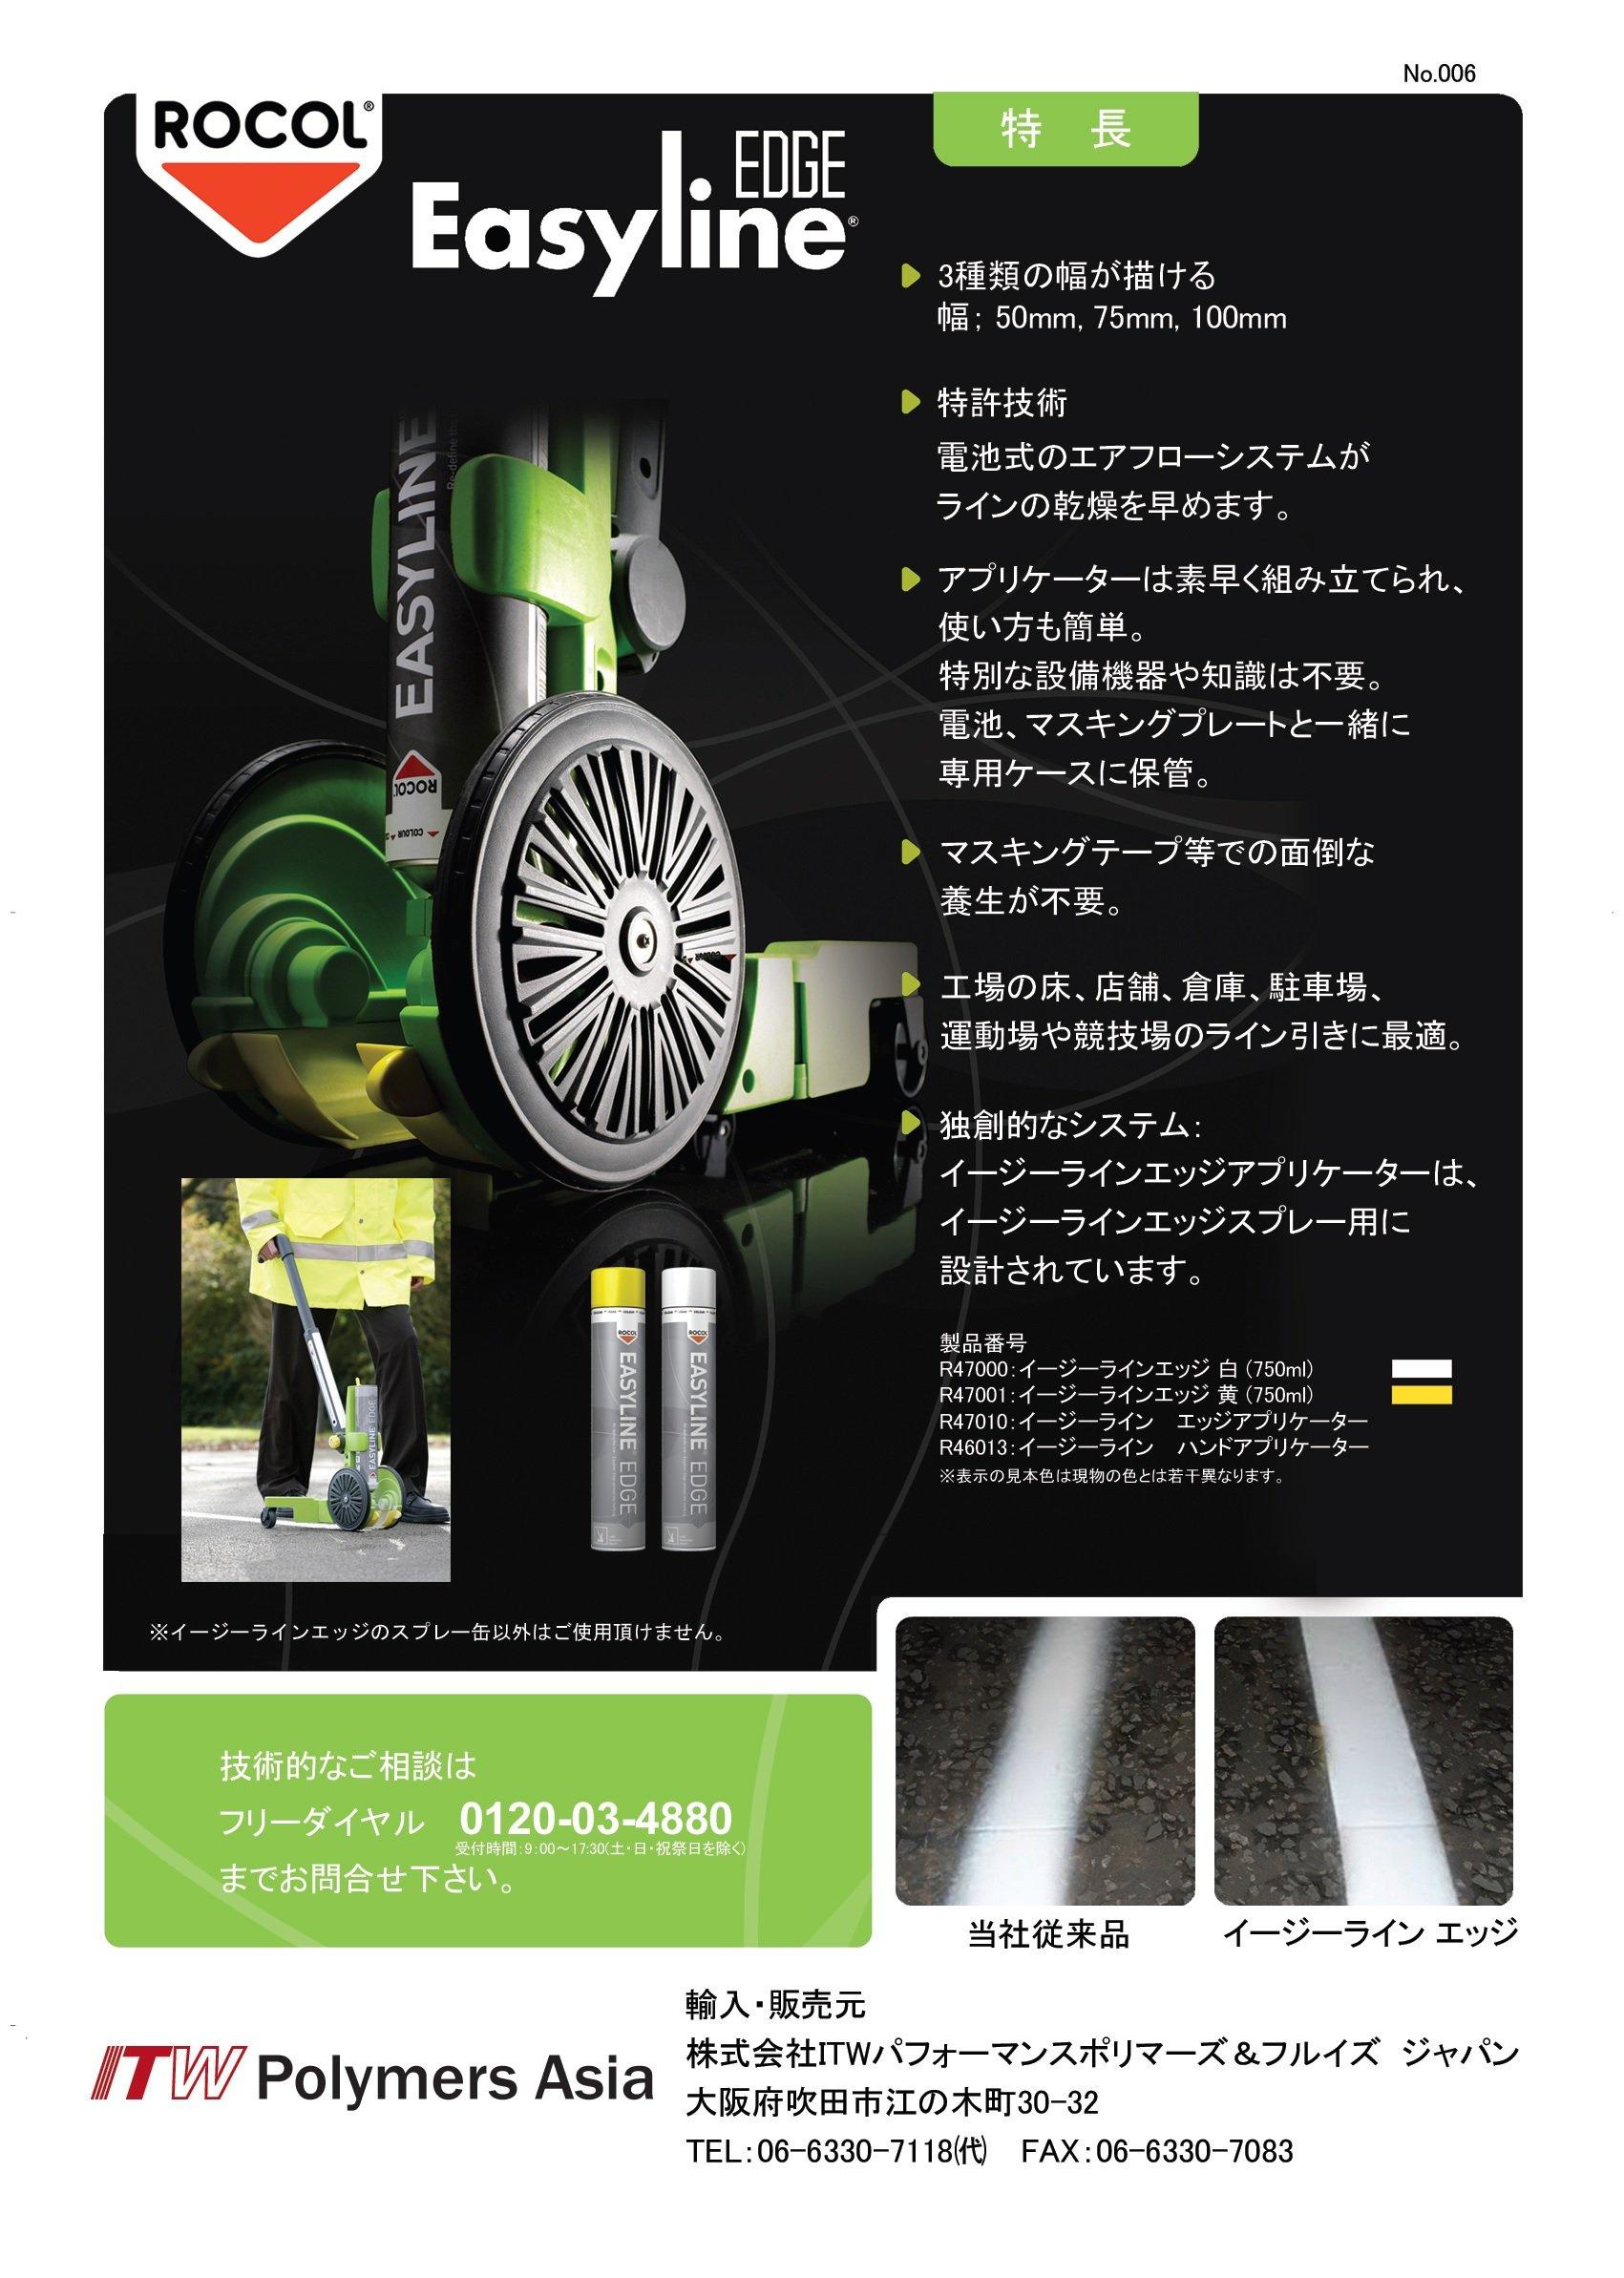 ROCOL EASYLINE EDGE APPLICATOR 500-47010